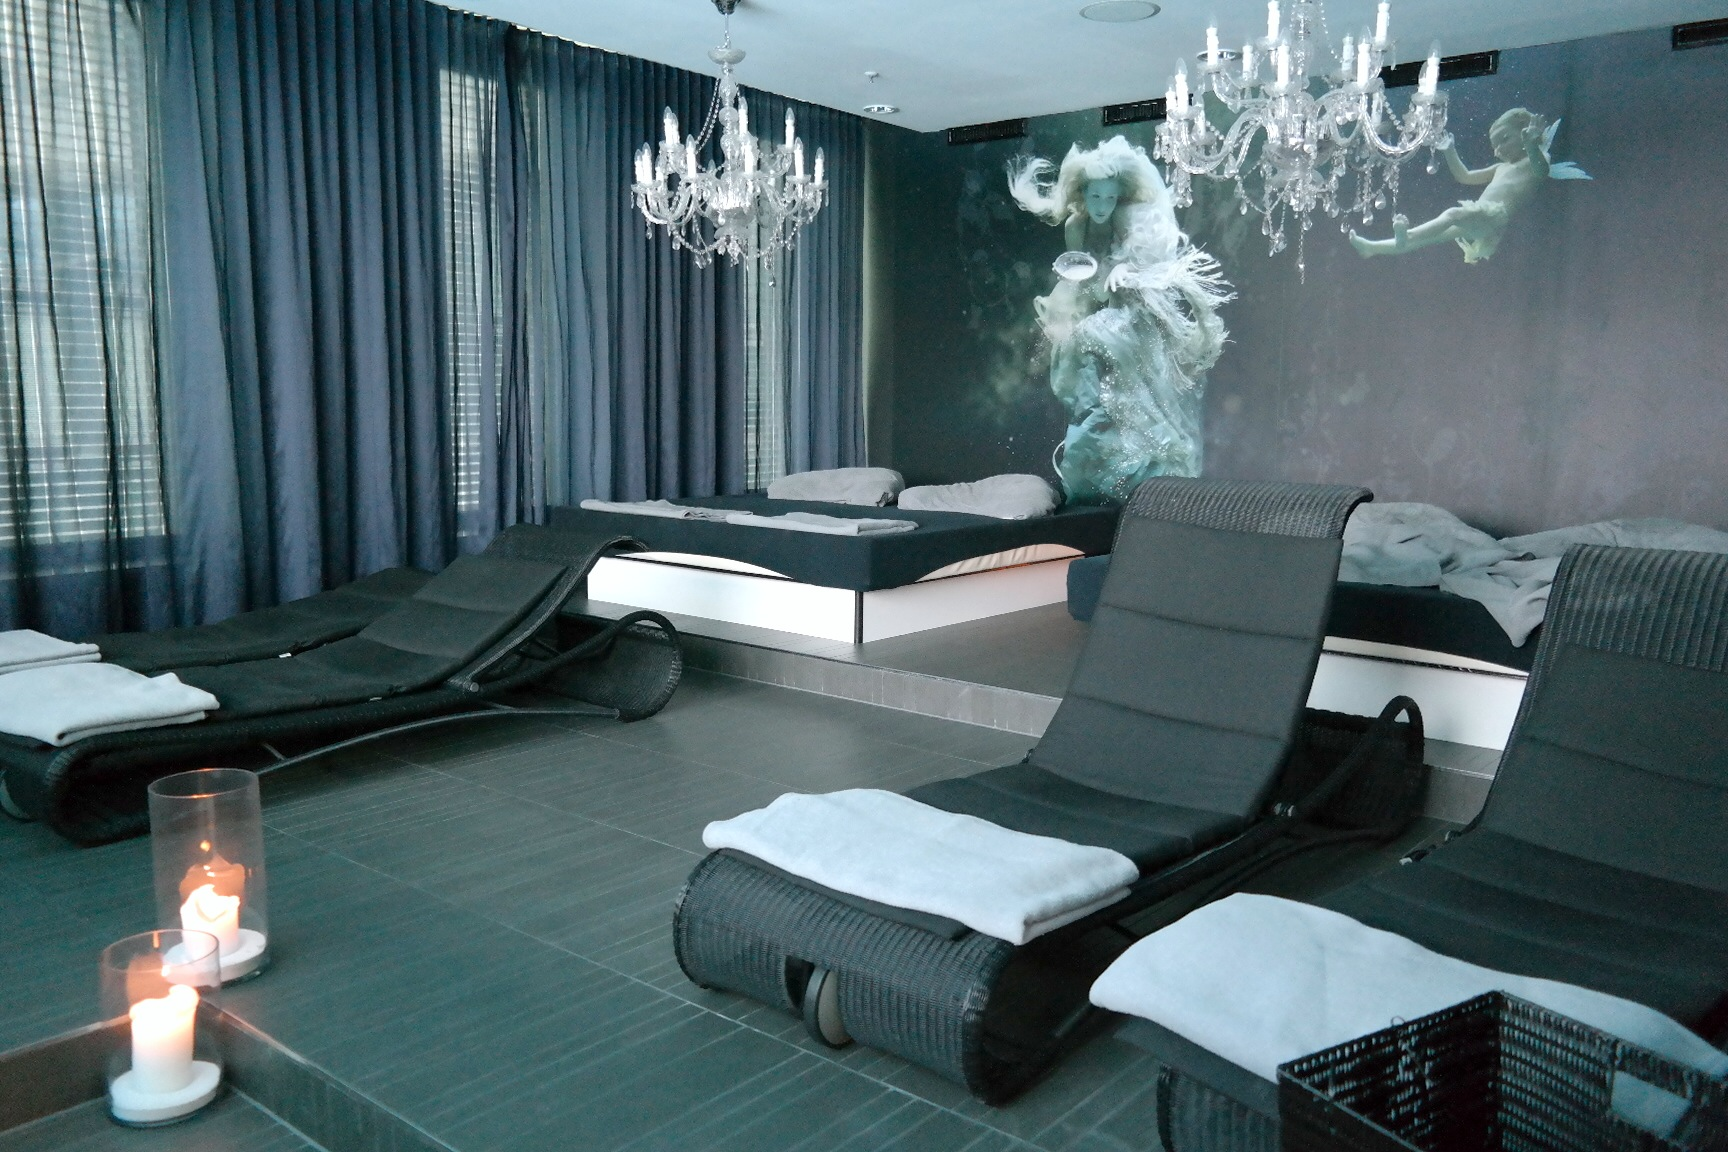 kameha grand hotel bonn rheinblick spa kosmetik wellness massagen erfahrung detoxkur ayurveda. Black Bedroom Furniture Sets. Home Design Ideas